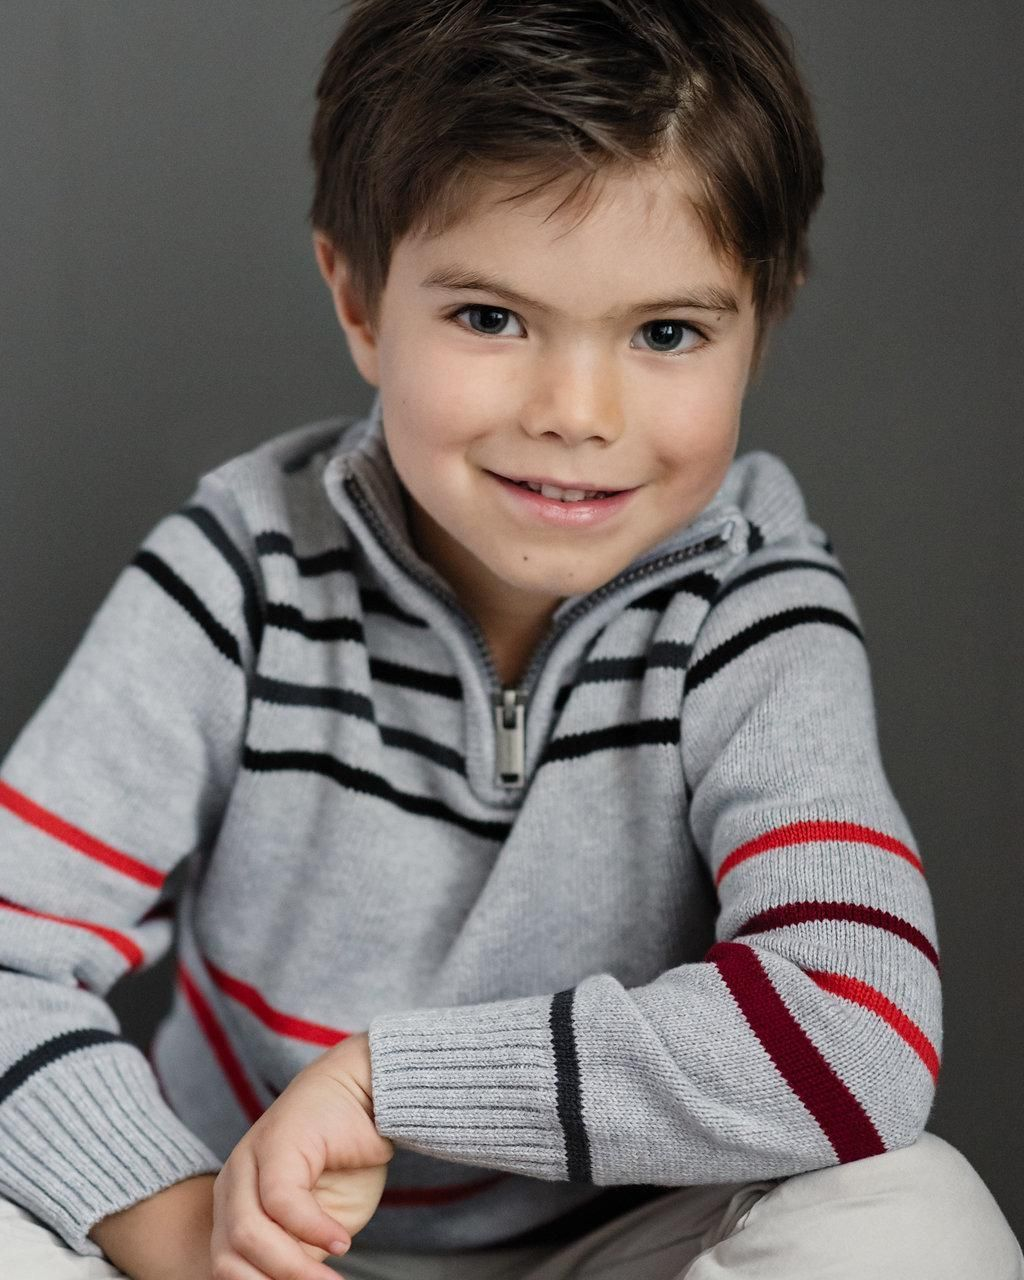 Sawyer Mainella